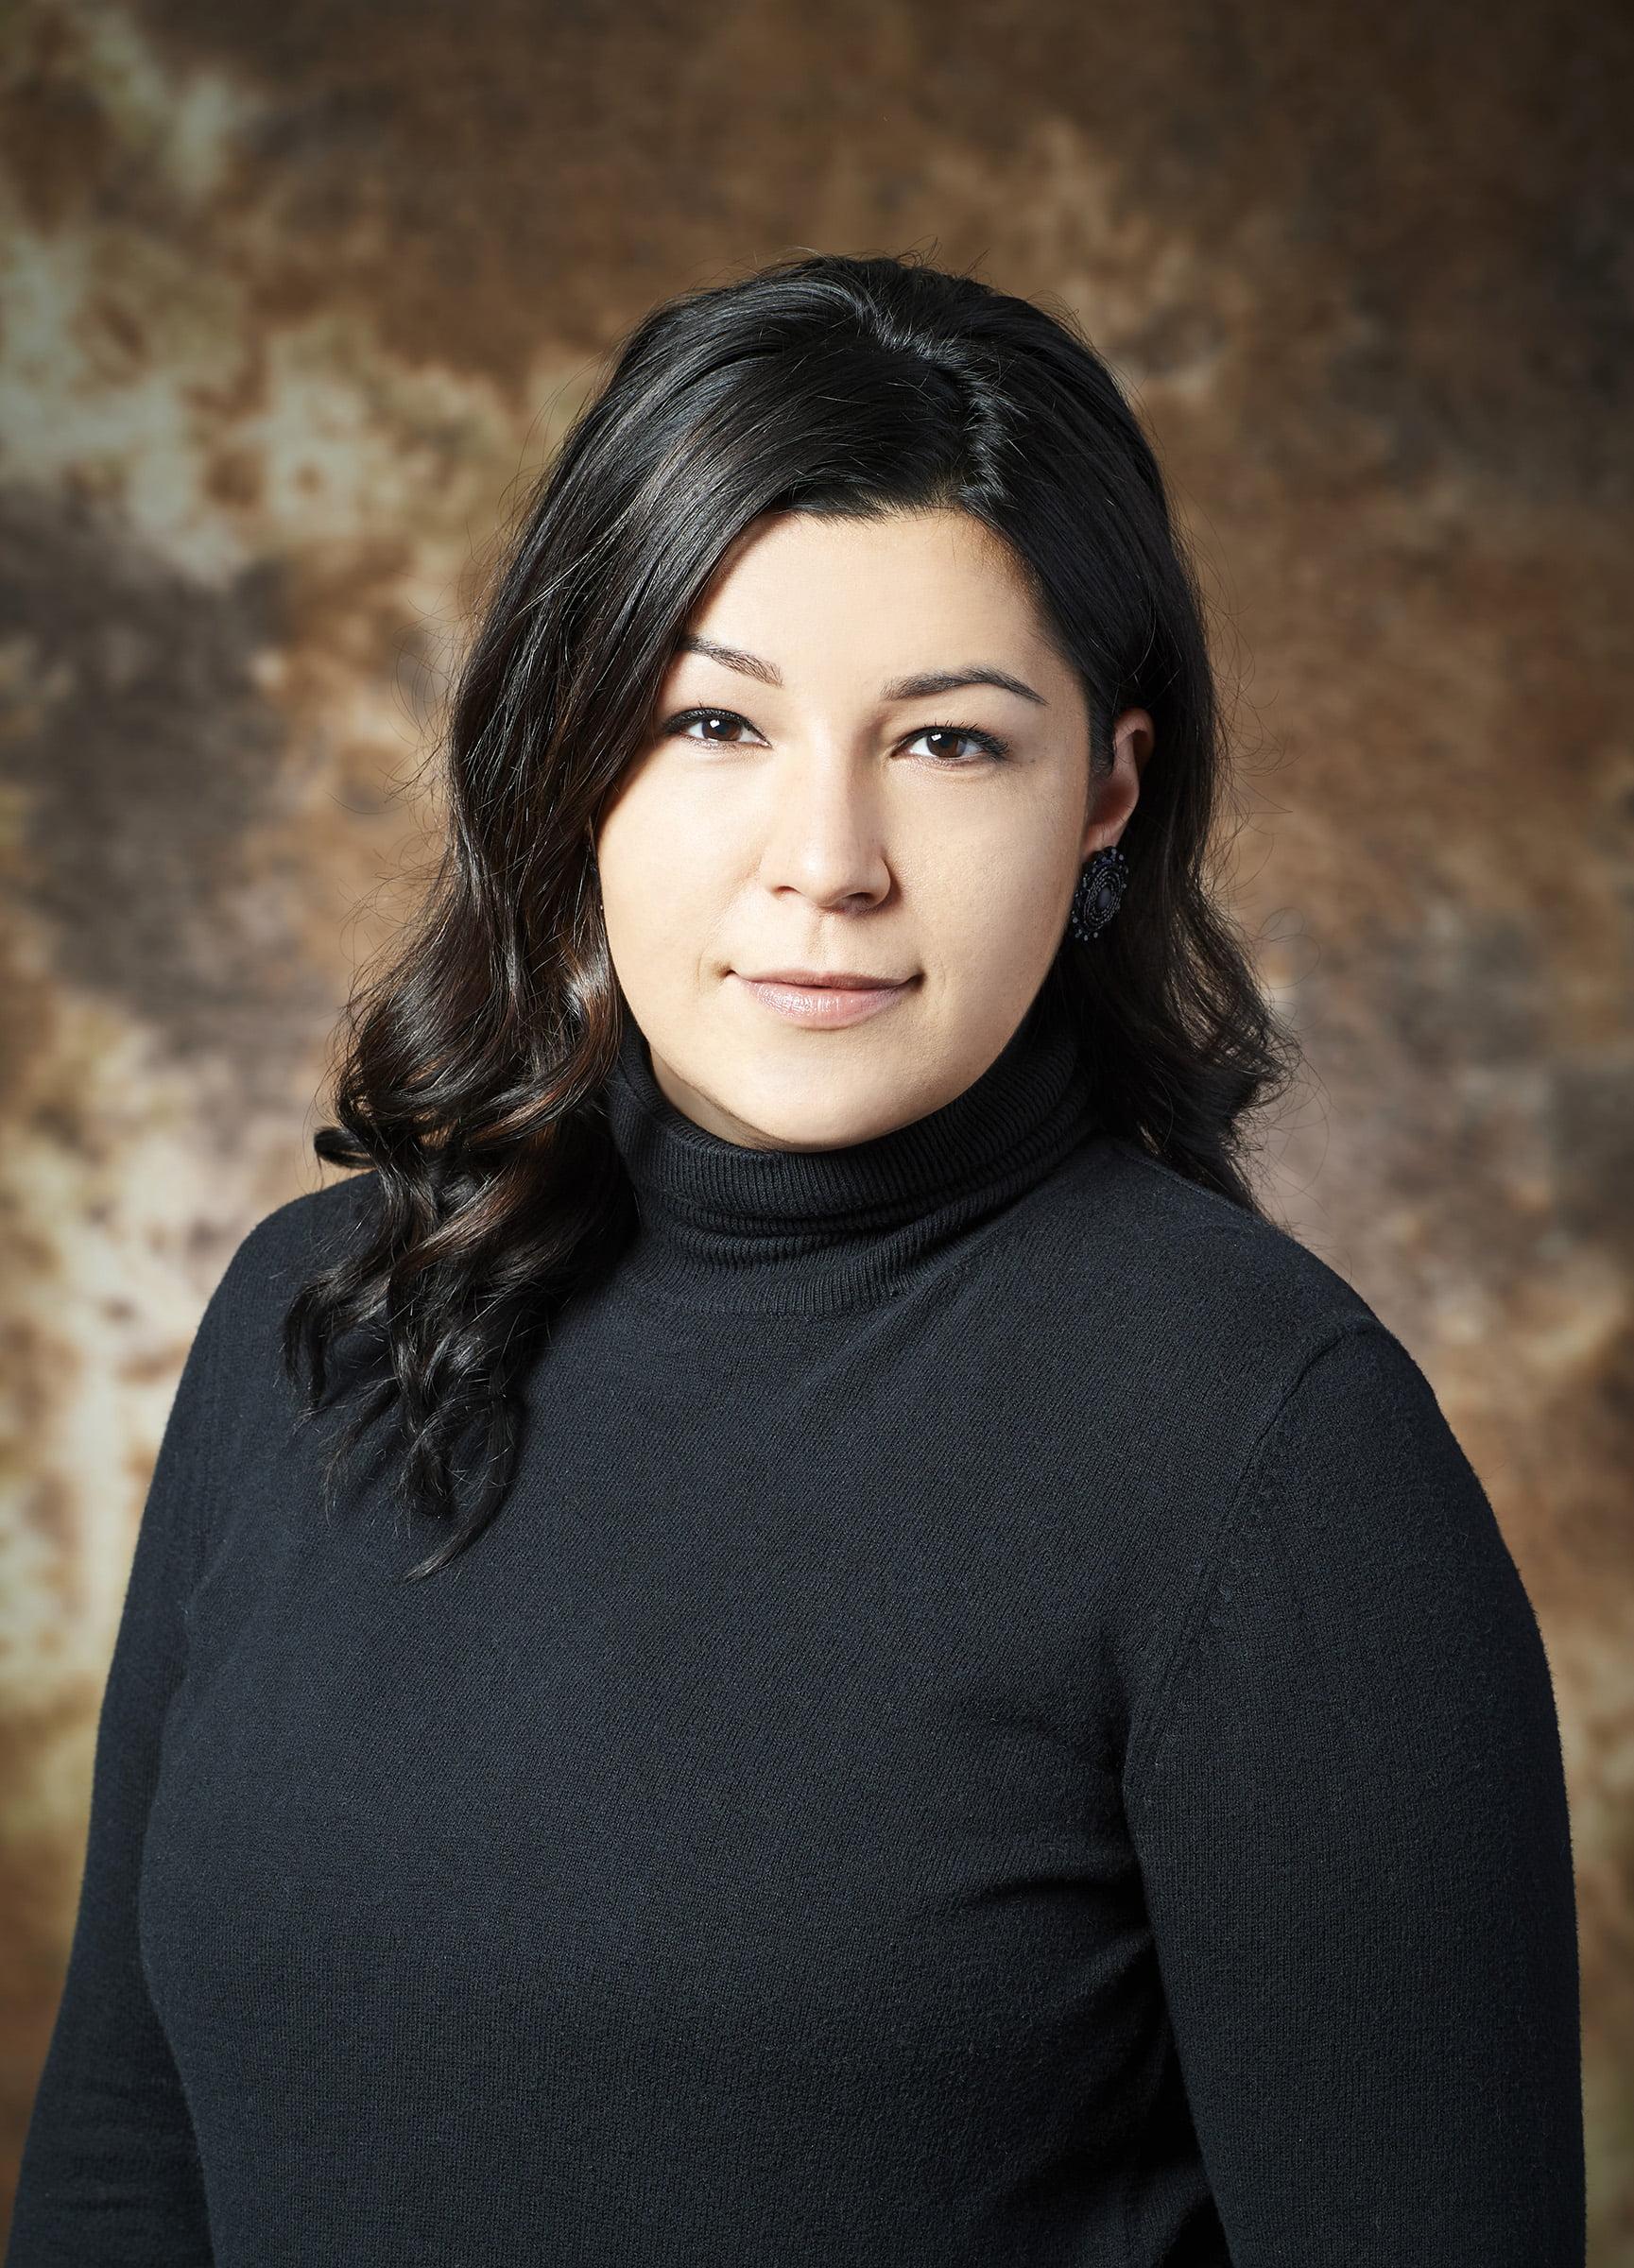 Alaina VanEvery 2763 8in